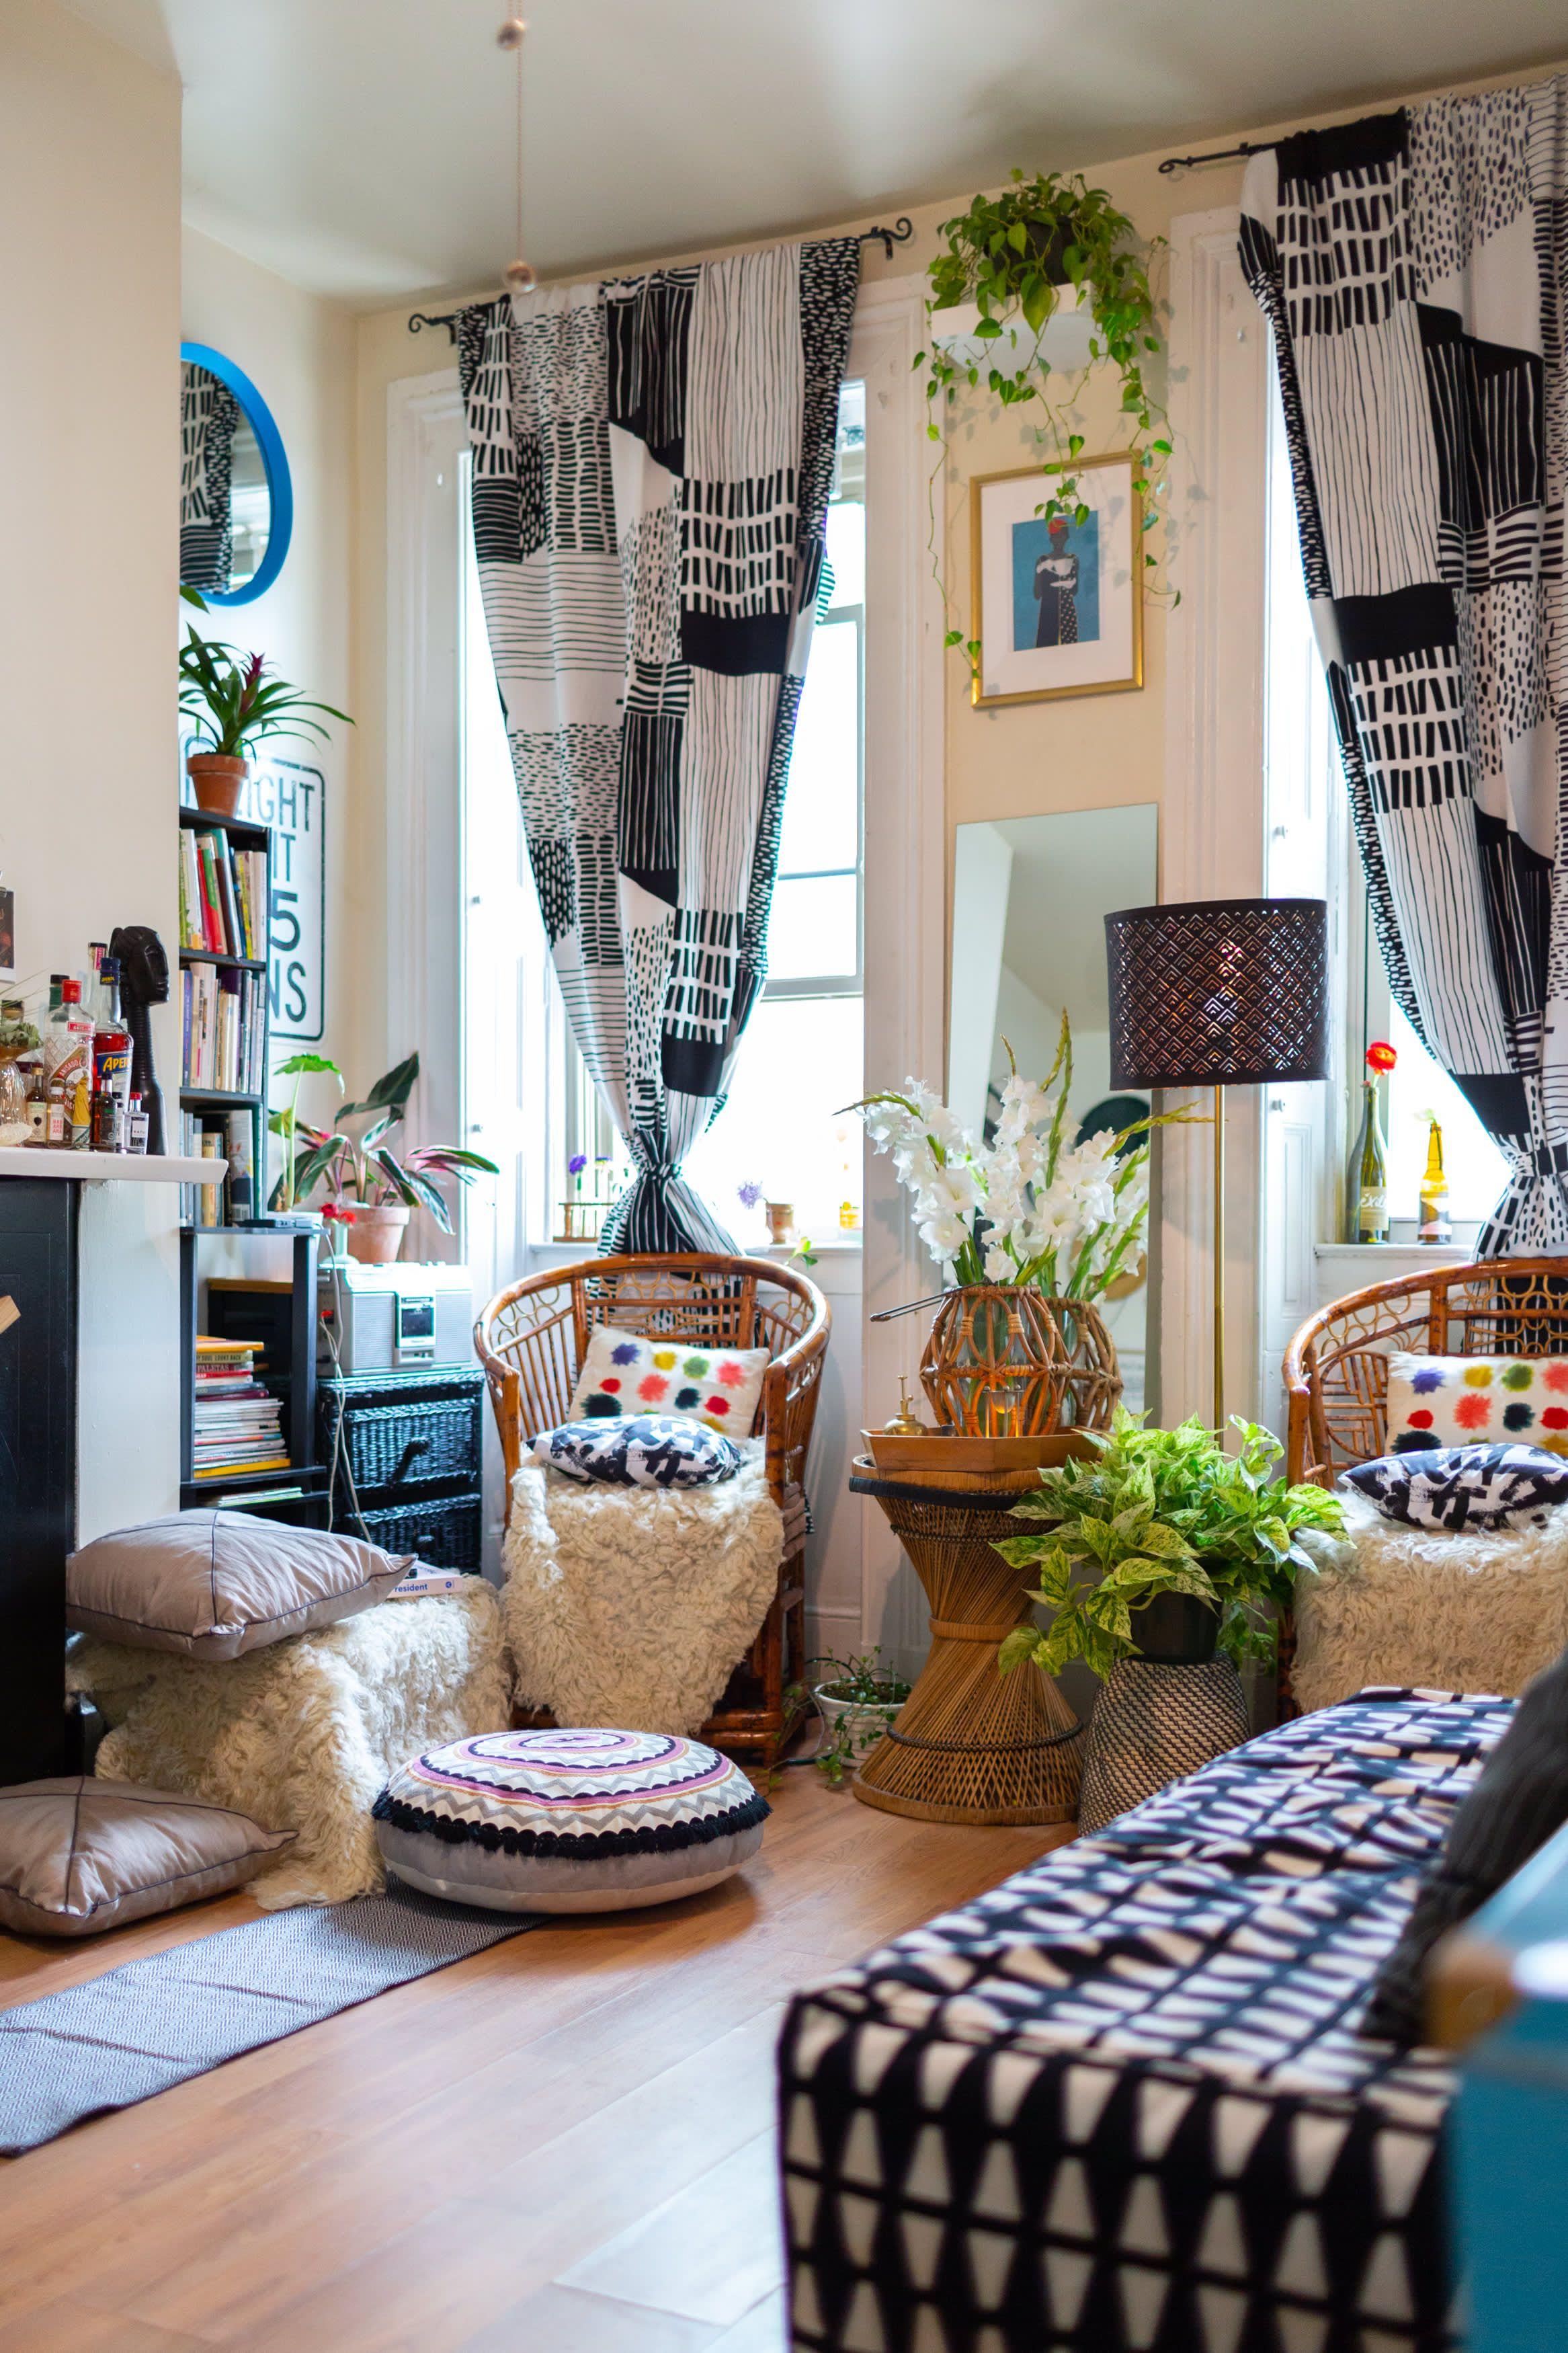 A Baker S 250 Square Foot Studio Celebrates Art Women And Creativity Tiny Studio Apartments Art Studio At Home Decor